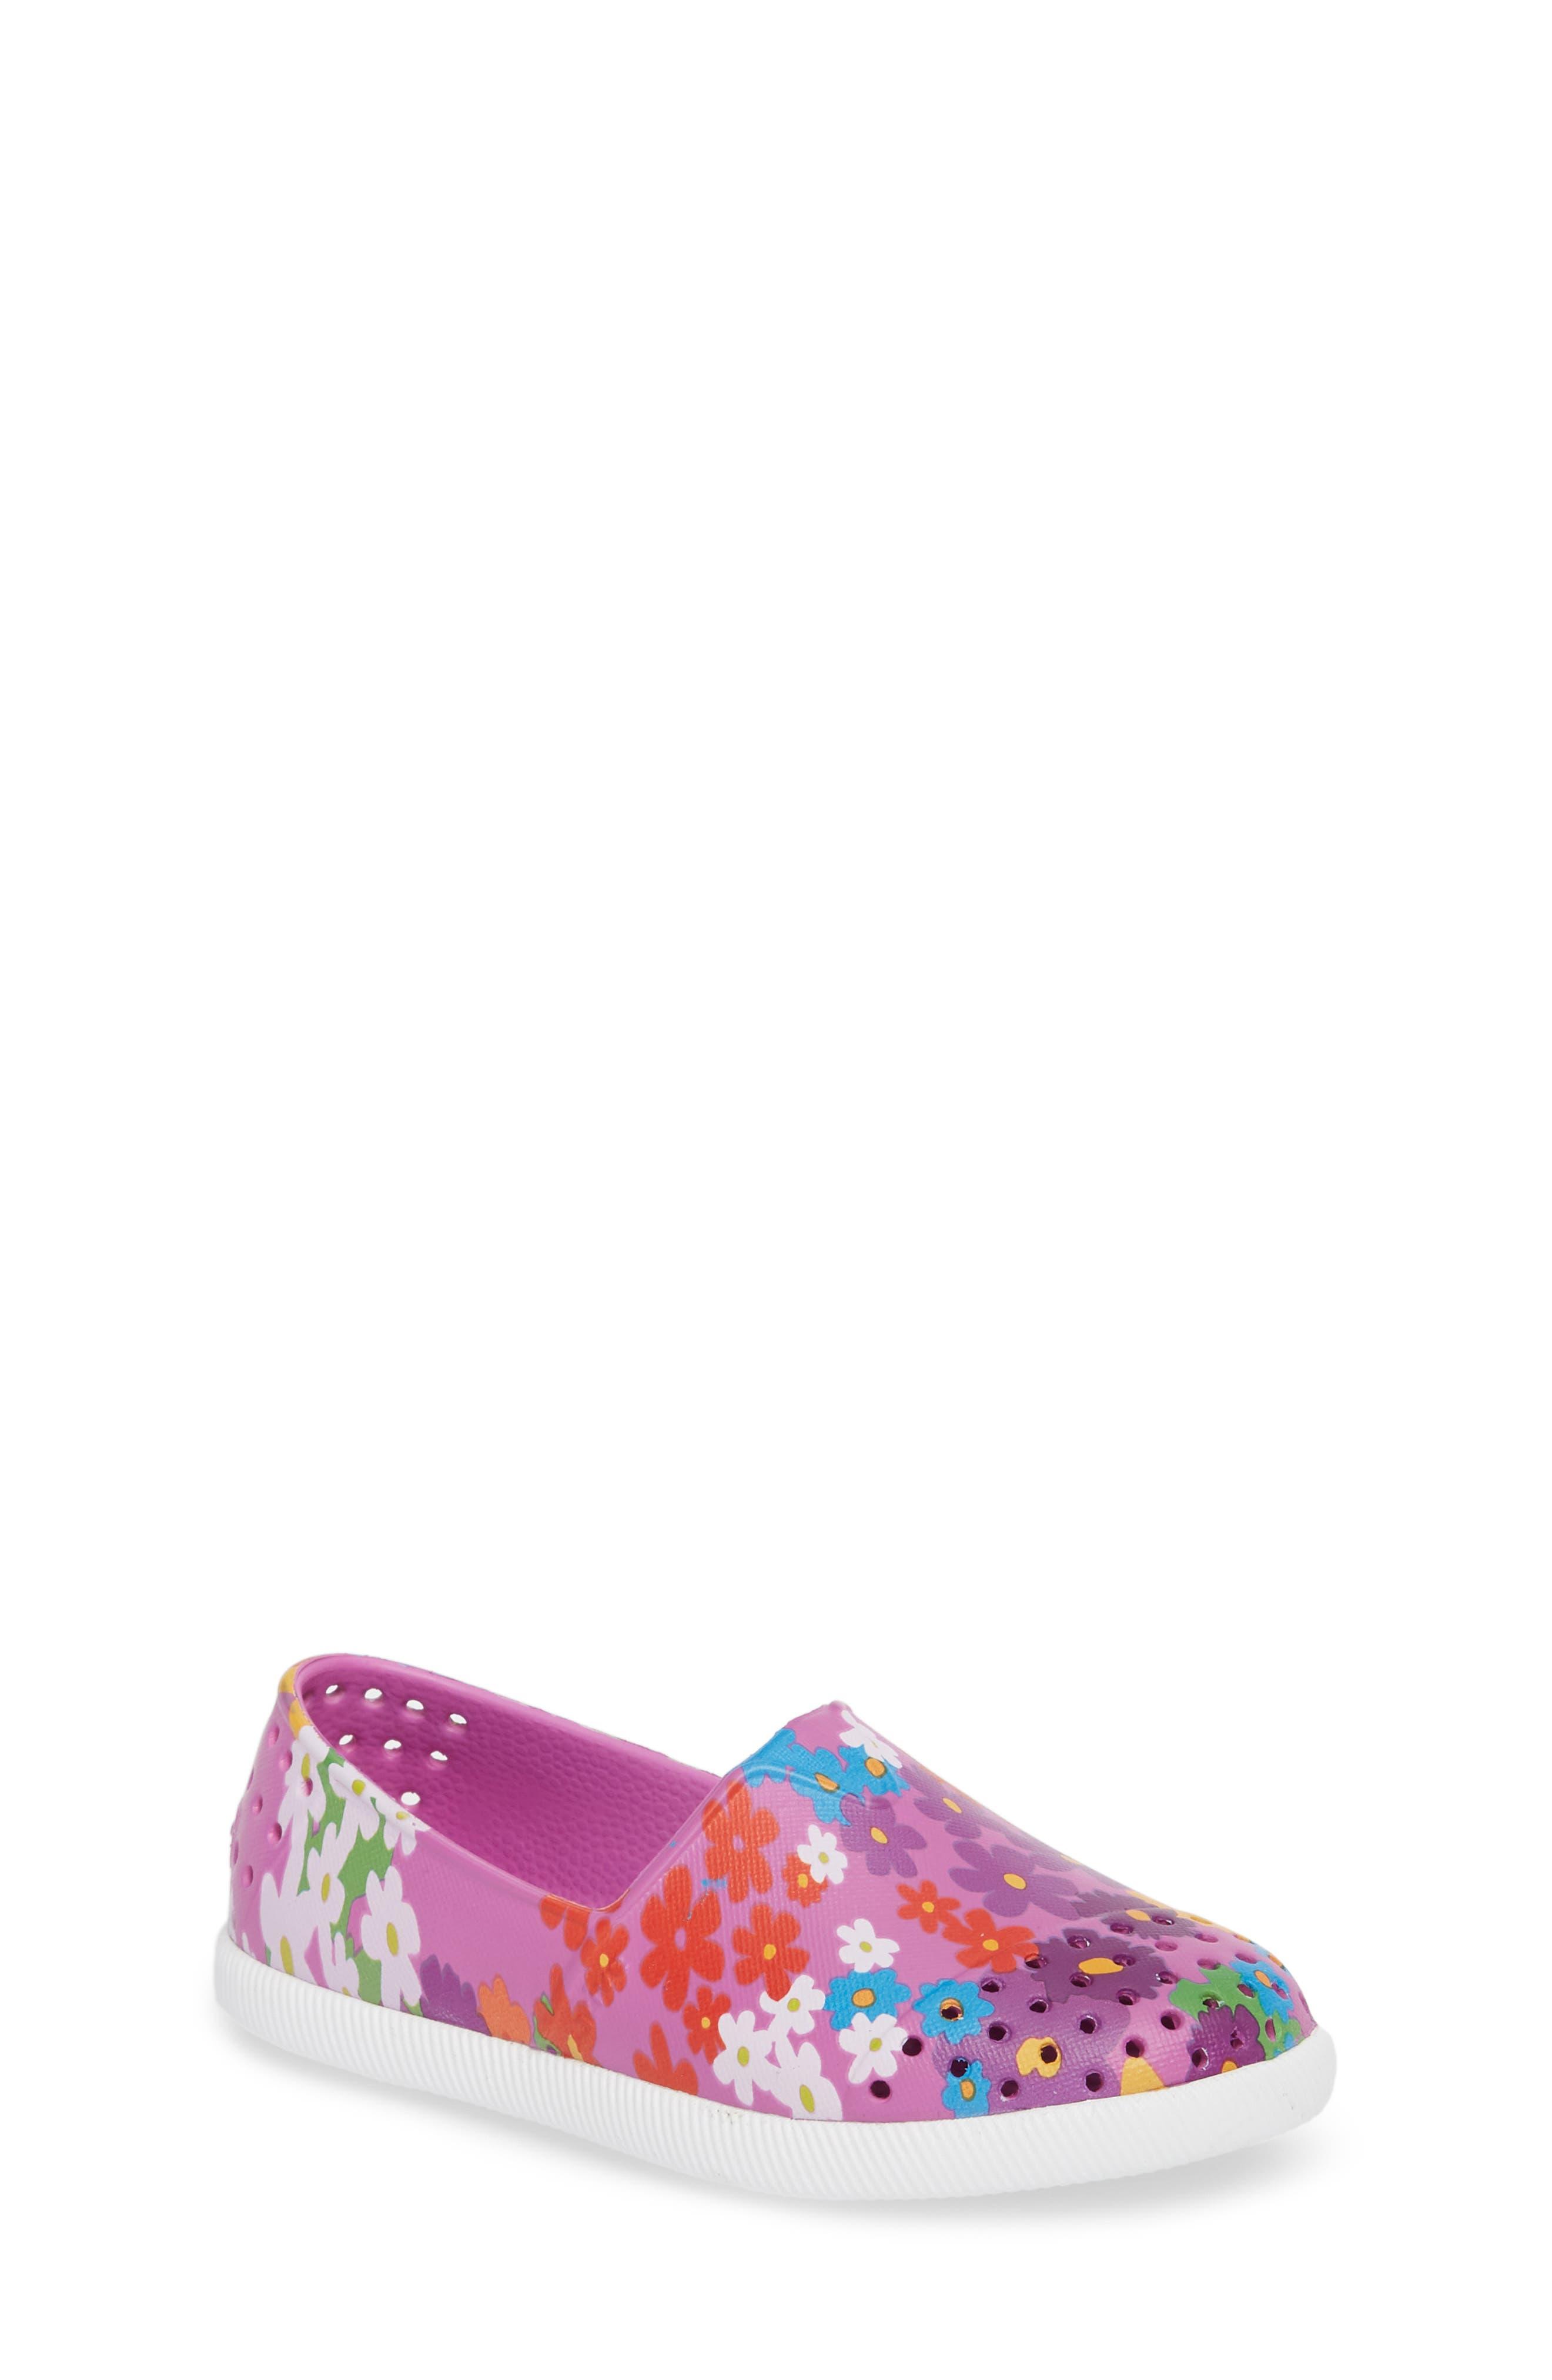 Verona Perforated Slip-On,                             Main thumbnail 1, color,                             Peace Purple/ White/ Daisy